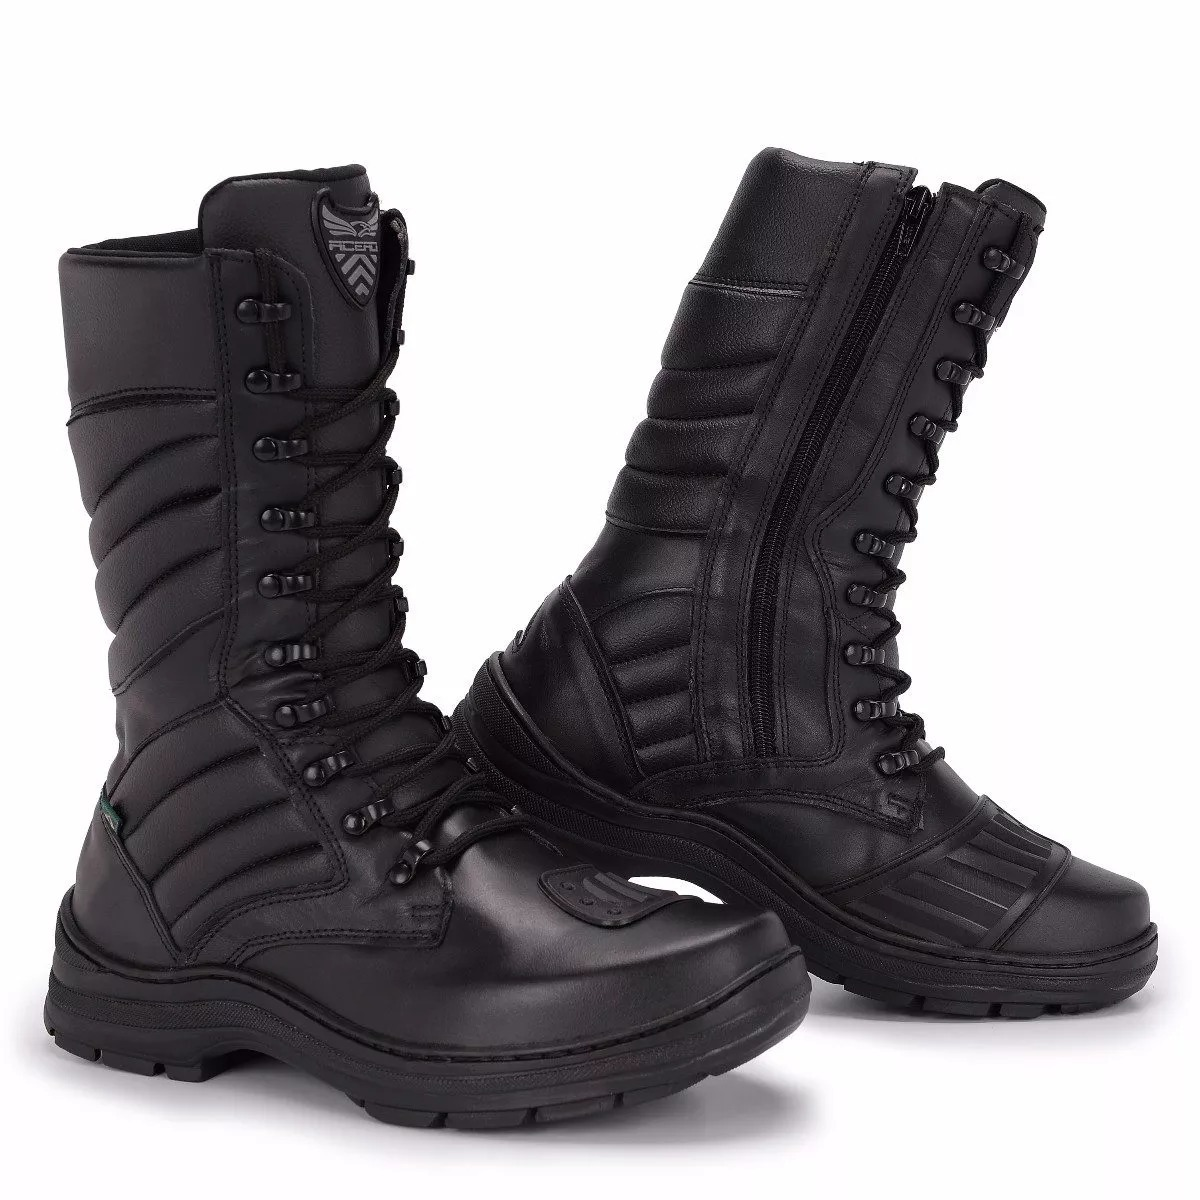 3785a73c94 bota acero coturno couro legitimo militar tático palm gel. Carregando zoom.